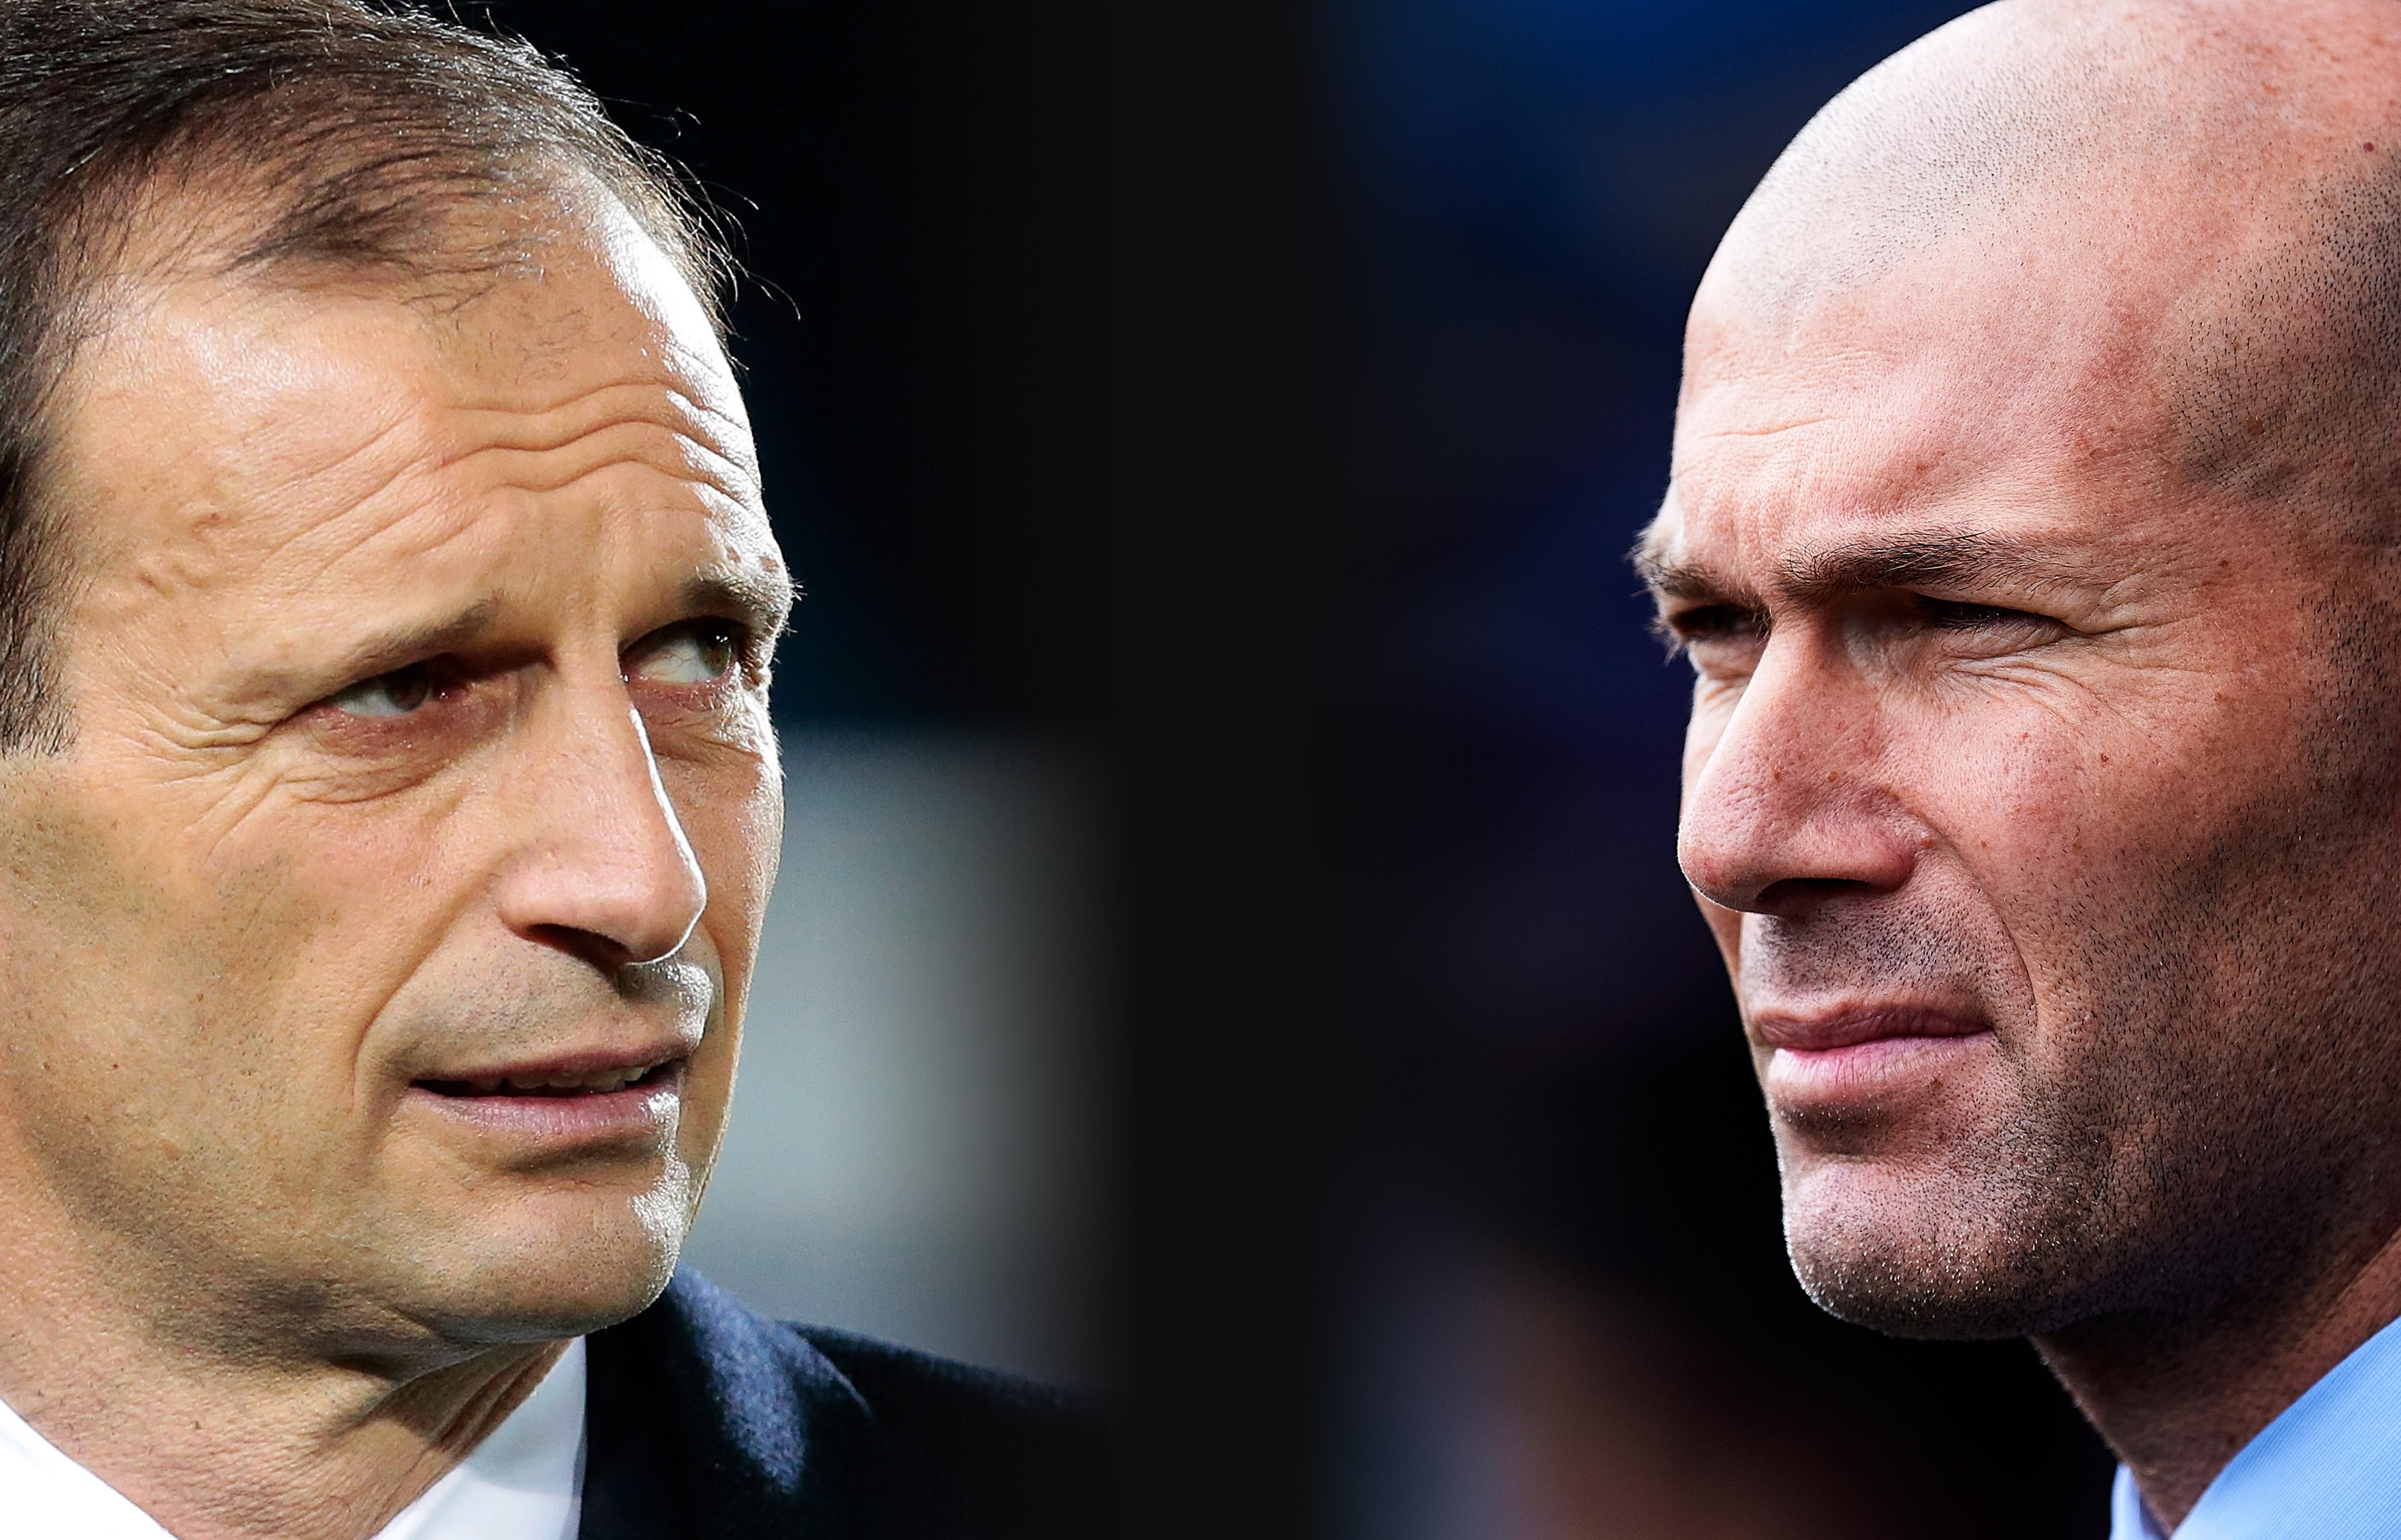 Juventus v Real Madrid - UEFA Champions League Quarter Final